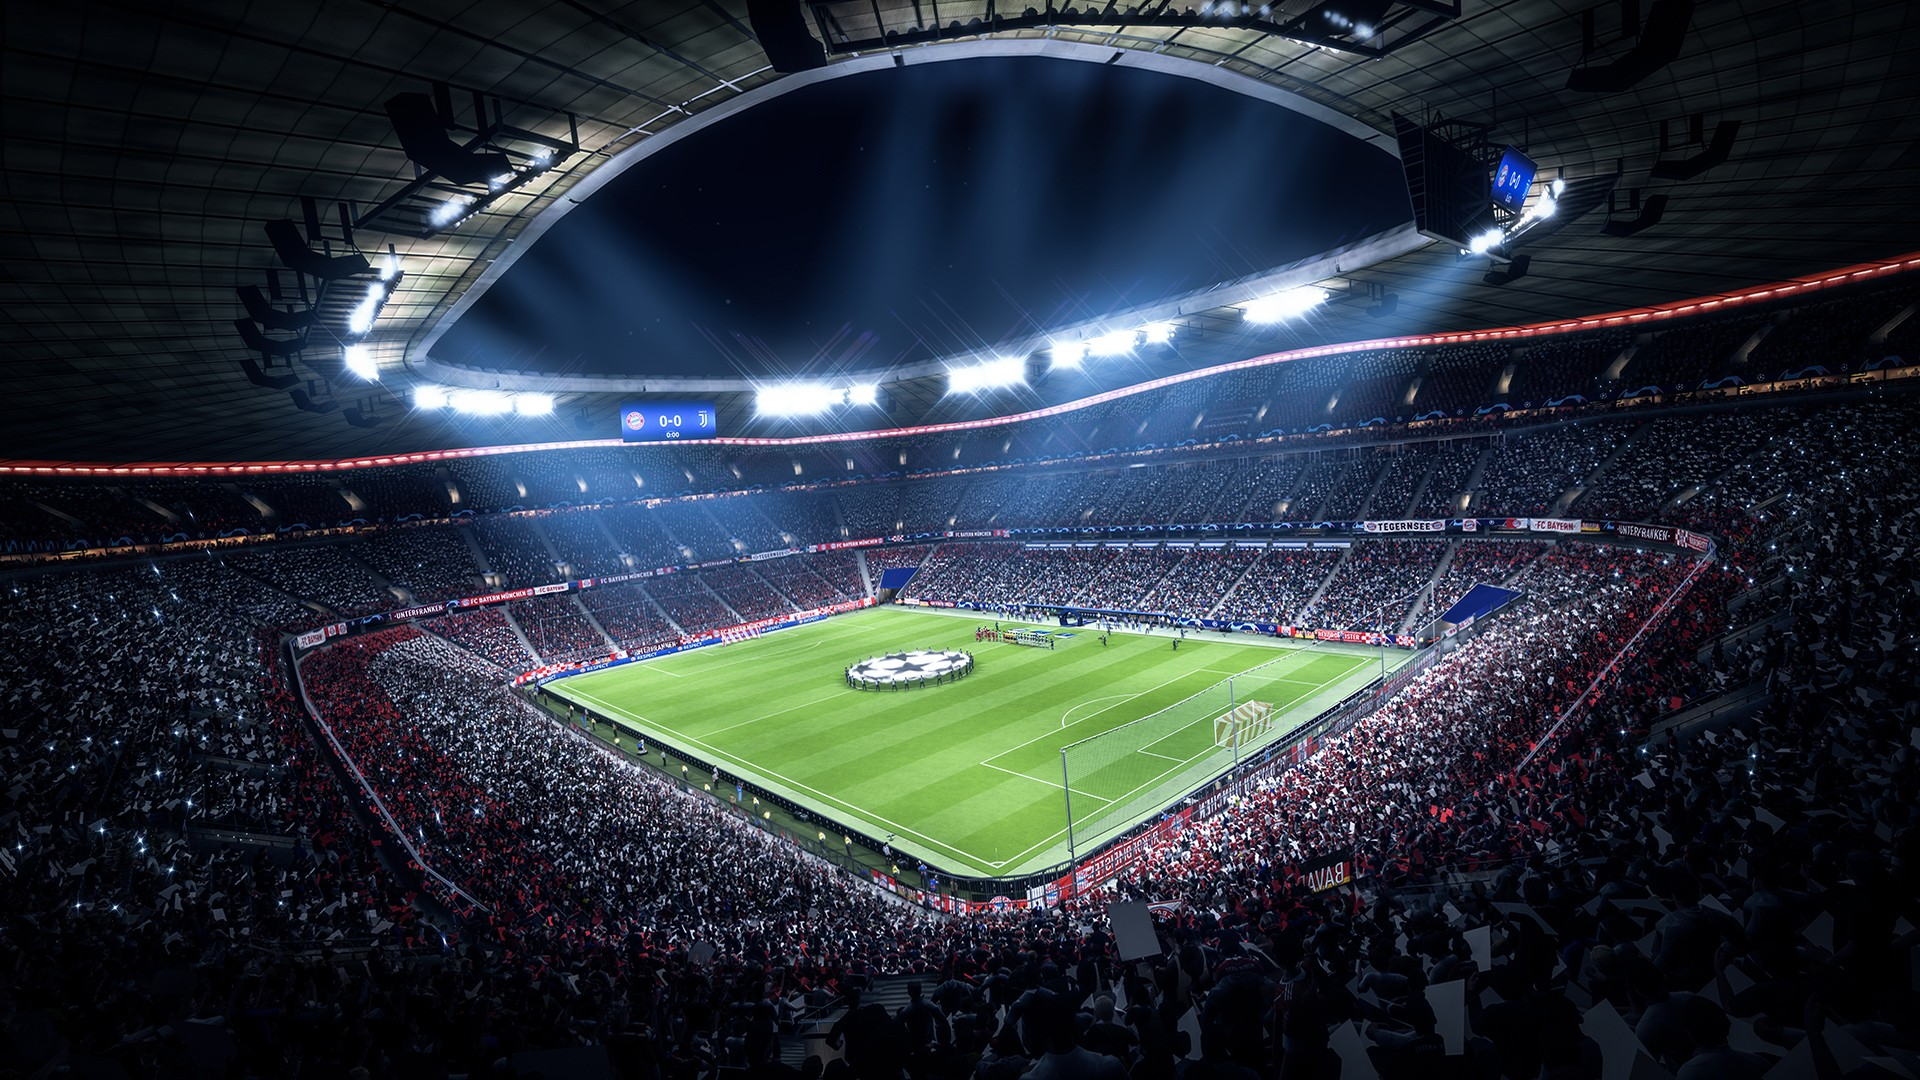 FIFA19_gdp_screenshot_allianz_arena.jpg